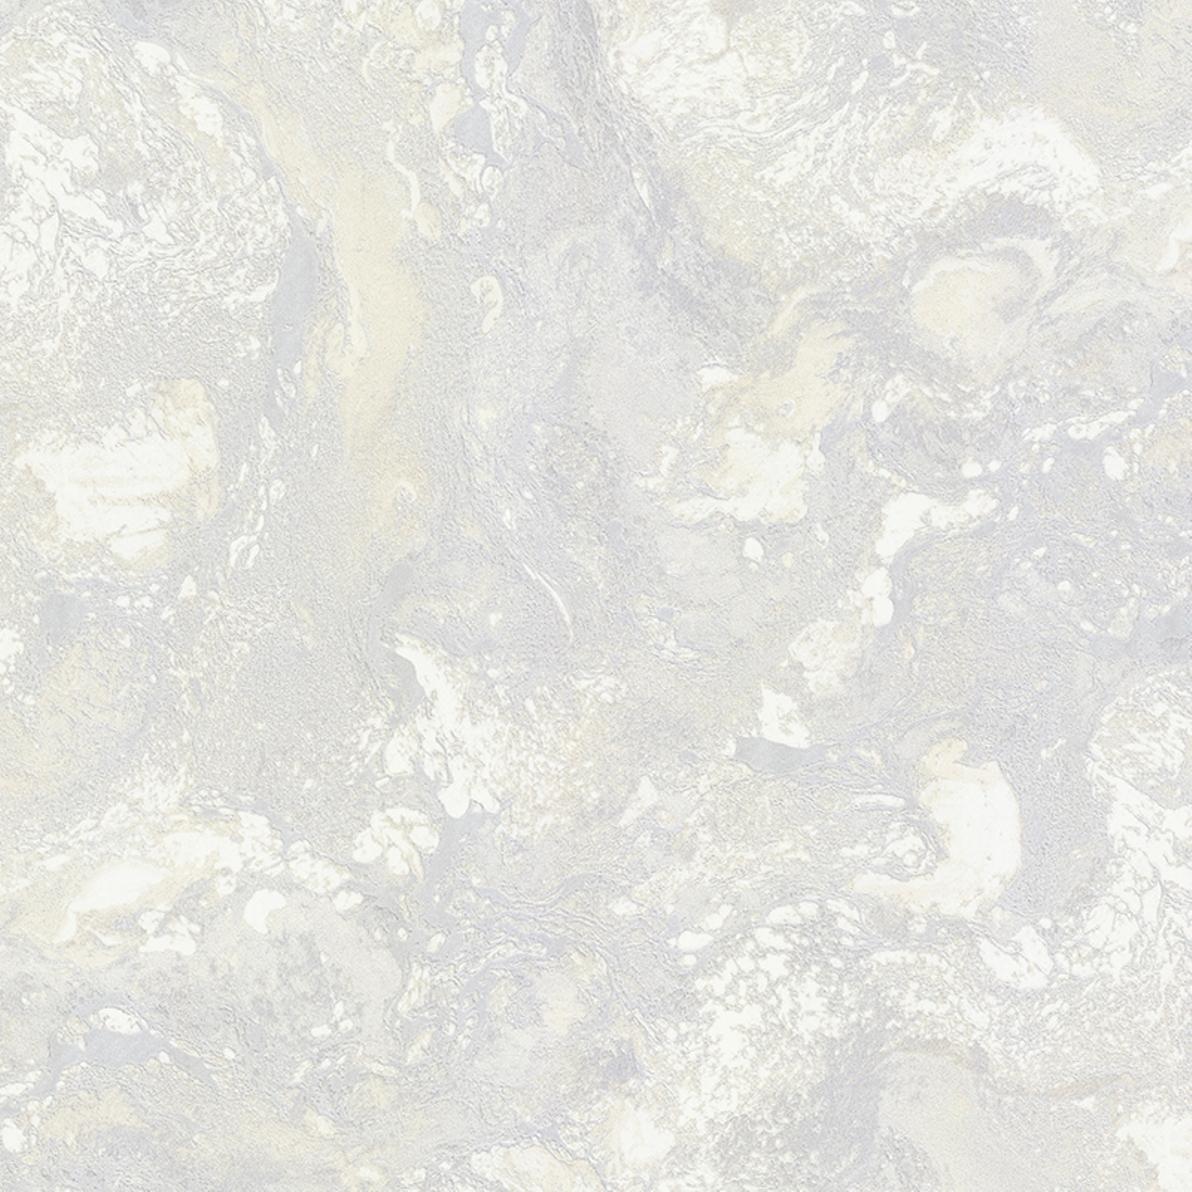 Обои Decori & Decori Carrara 82672